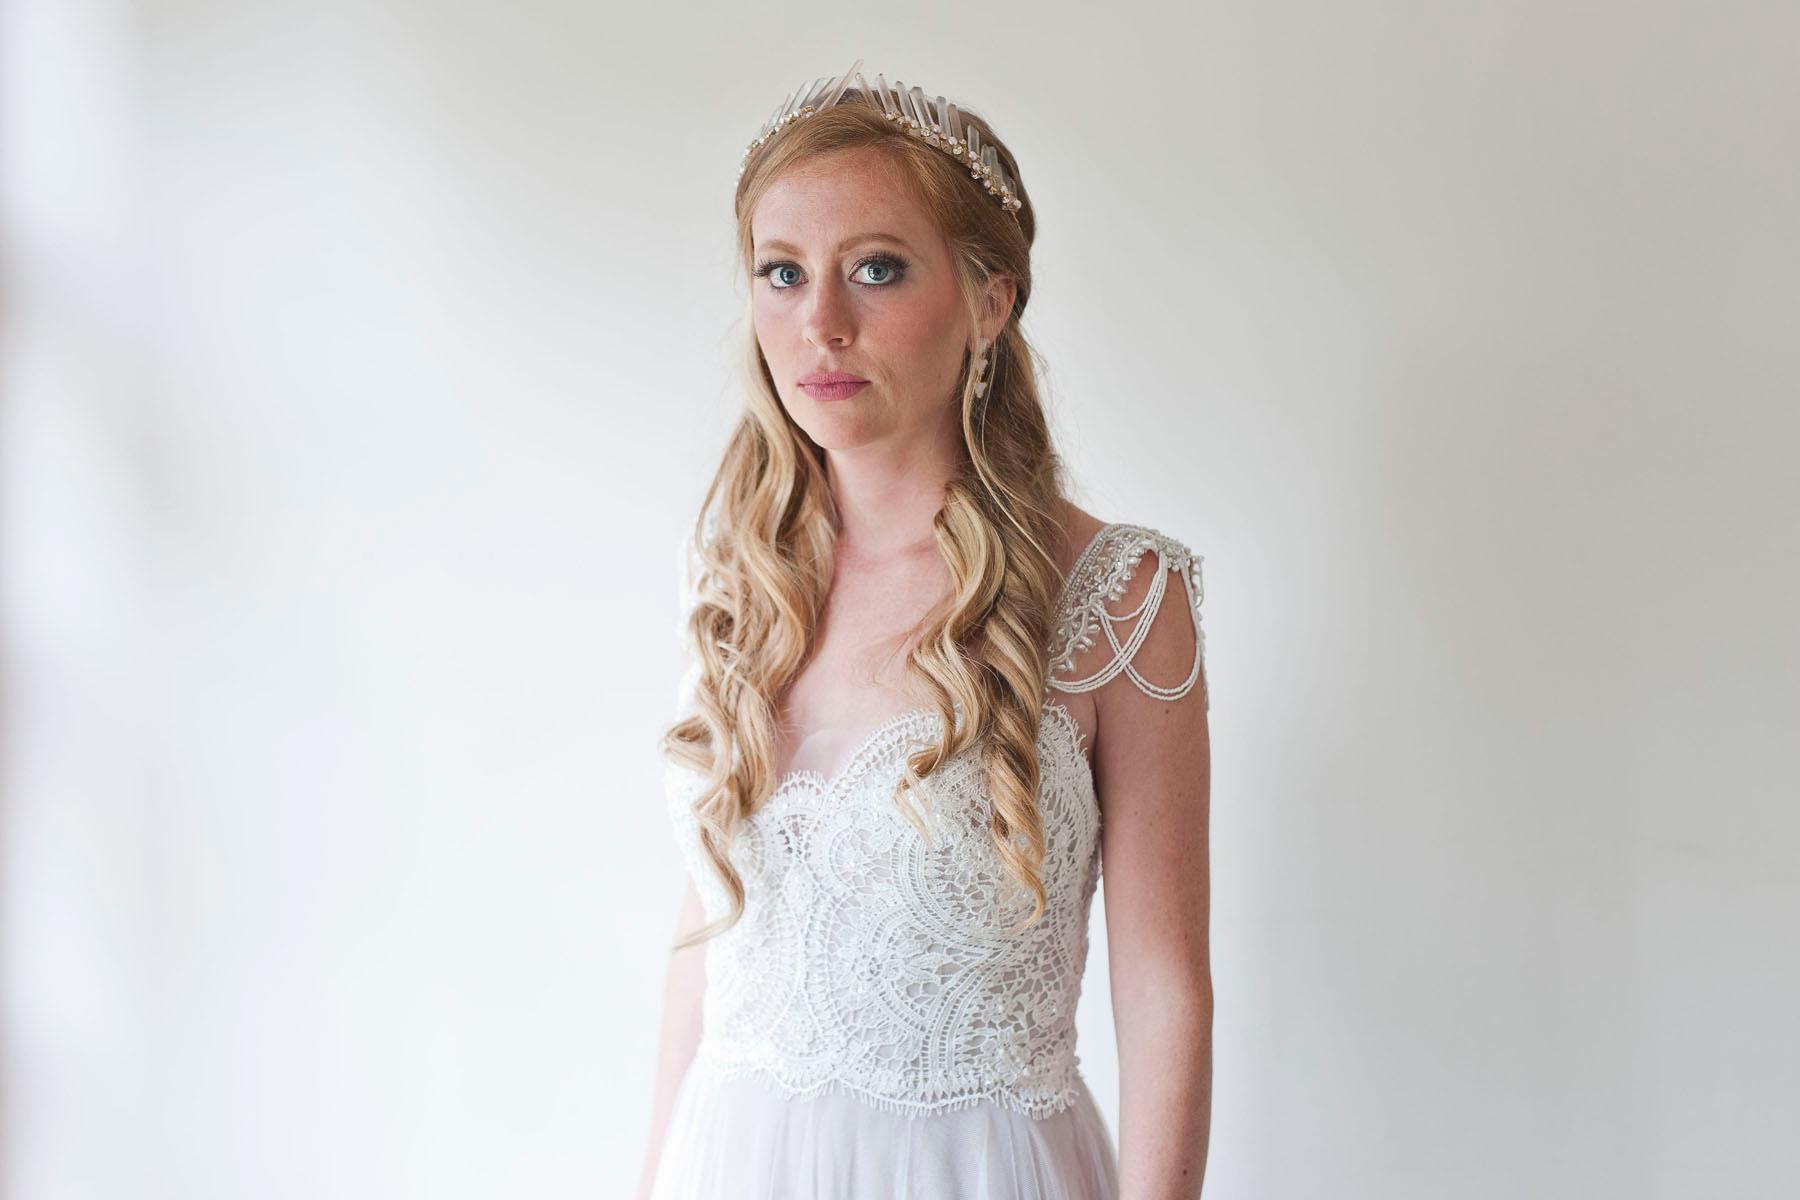 Bucks_County_wedding_photographer_Stroudsmoor_country_inn_wedding_Philadelphia_wedding_photographer_01_fairy_inspired_bride_with_crystal_crown.JPG